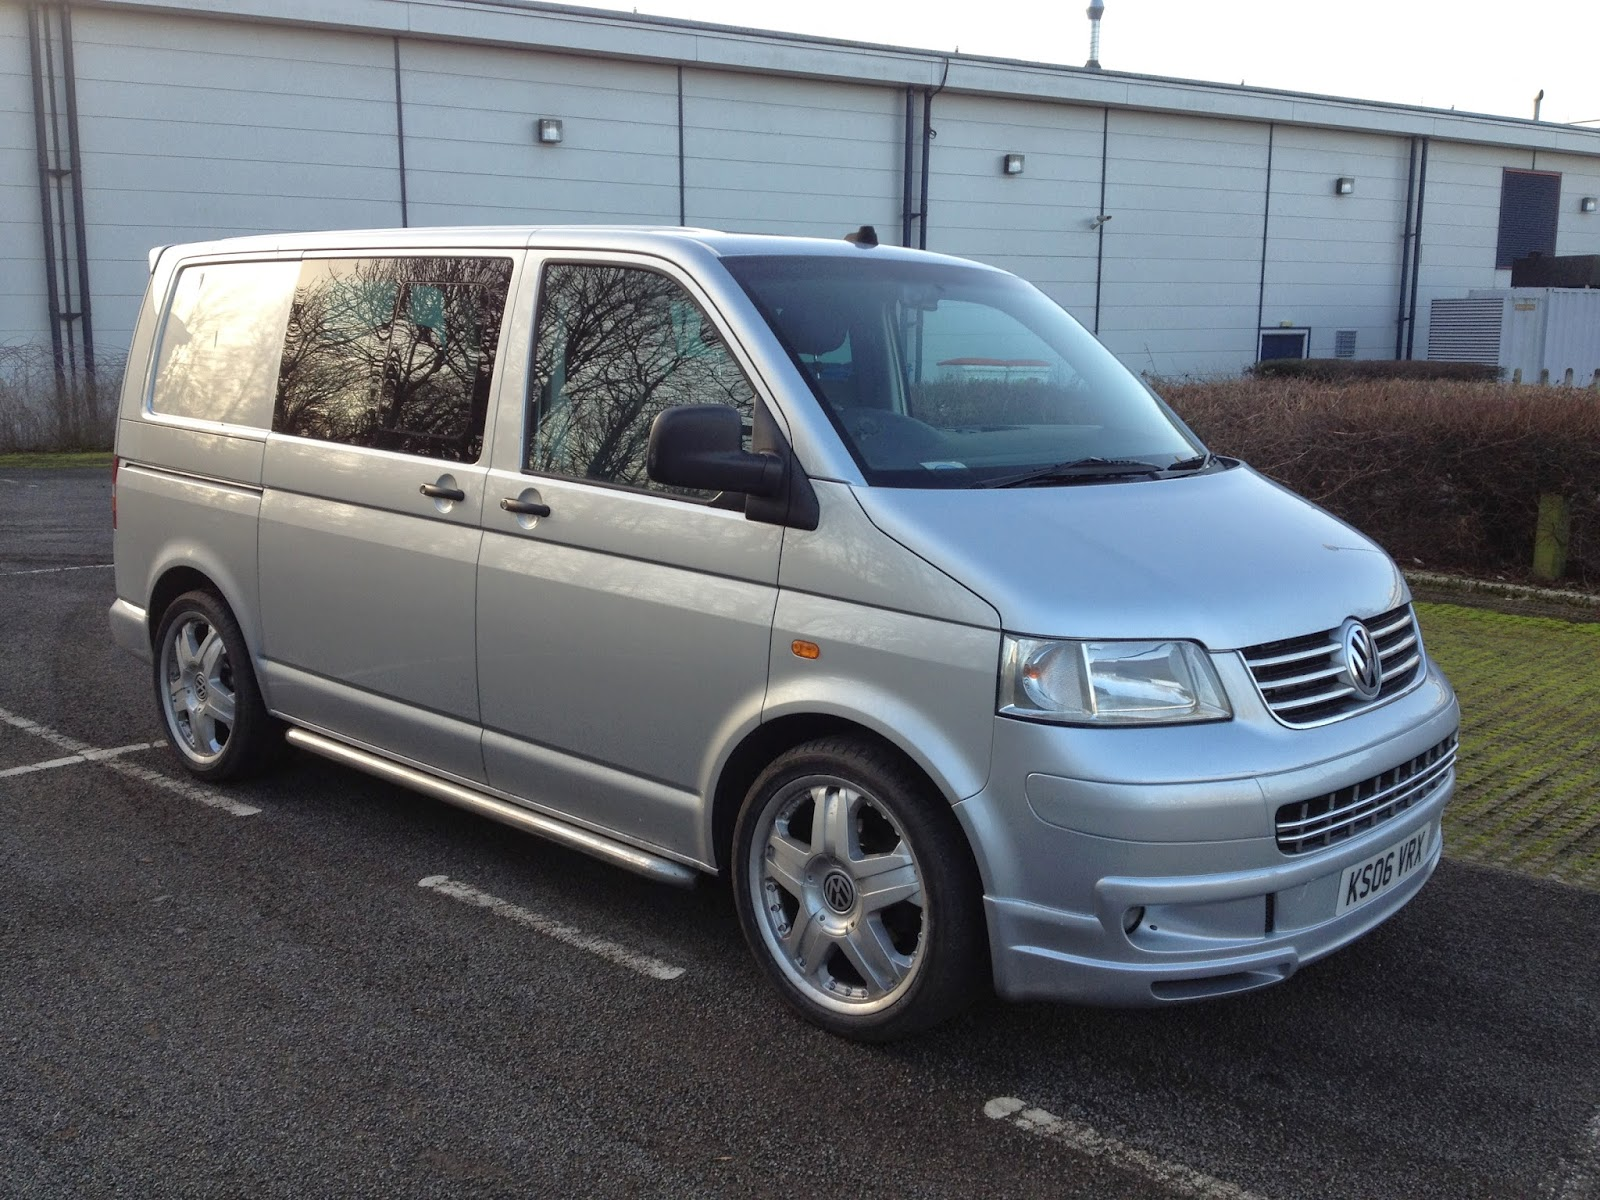 VW T5 Van Conversion